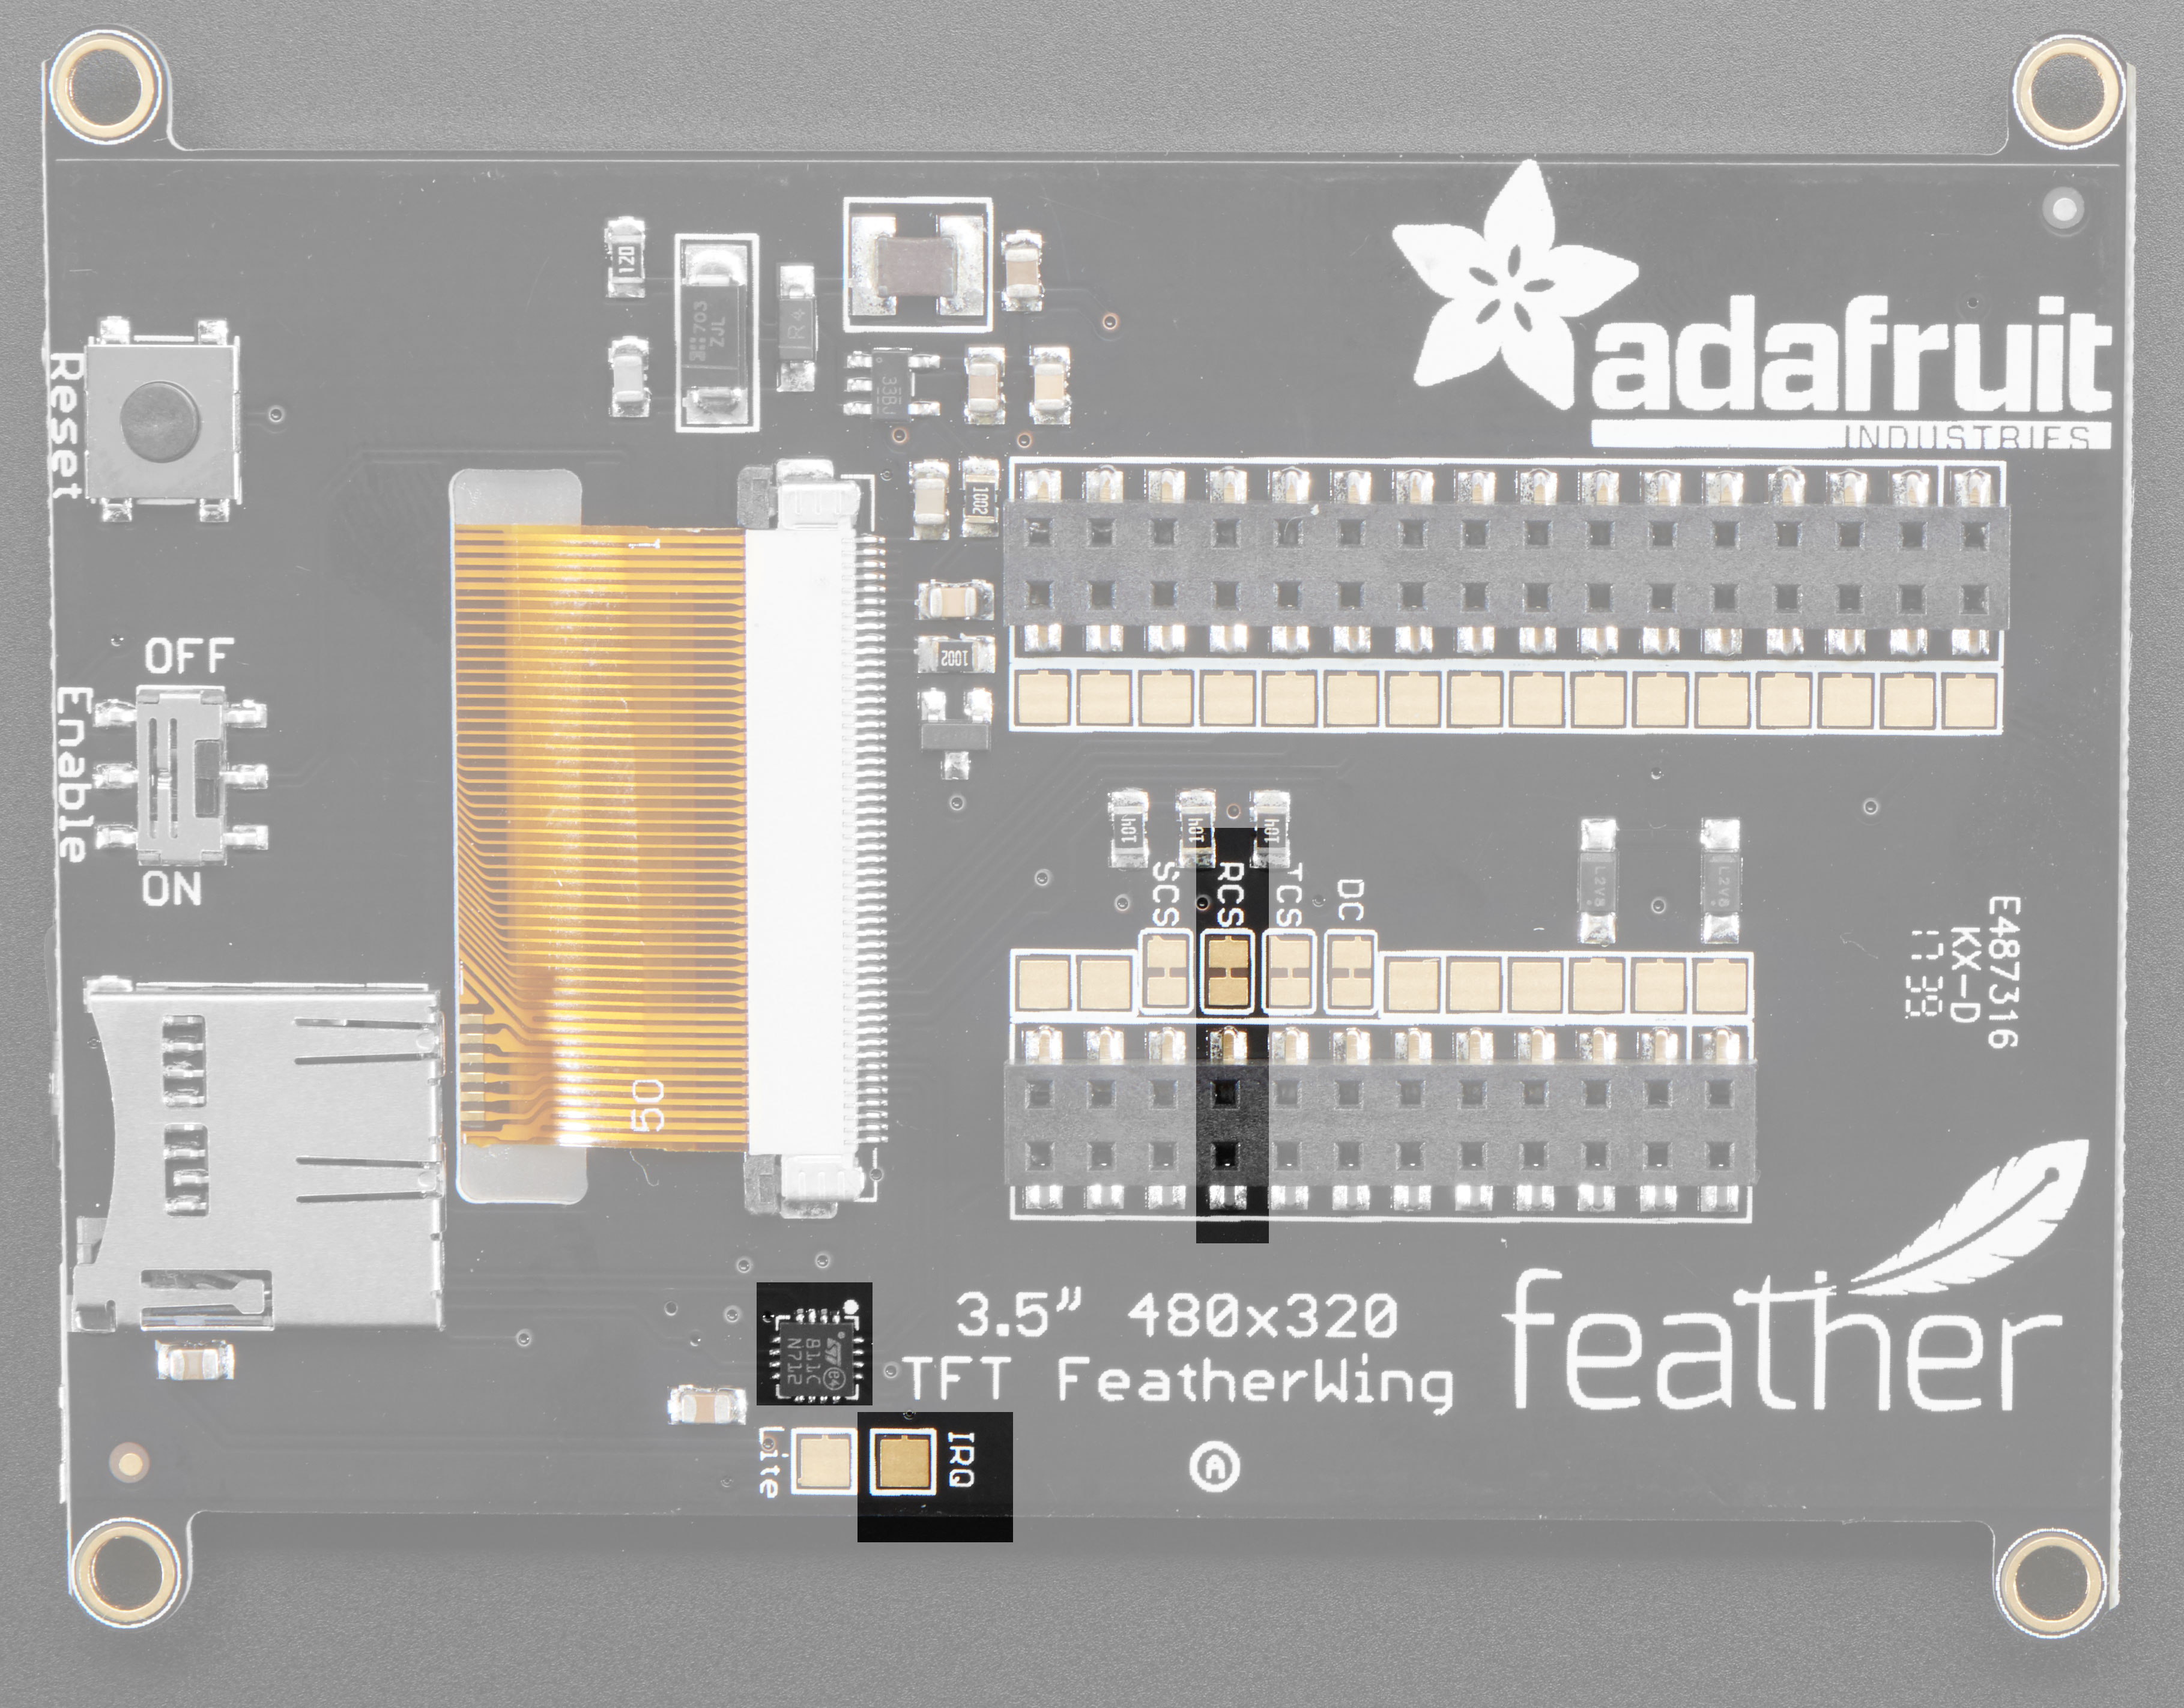 adafruit_products_ts.jpg